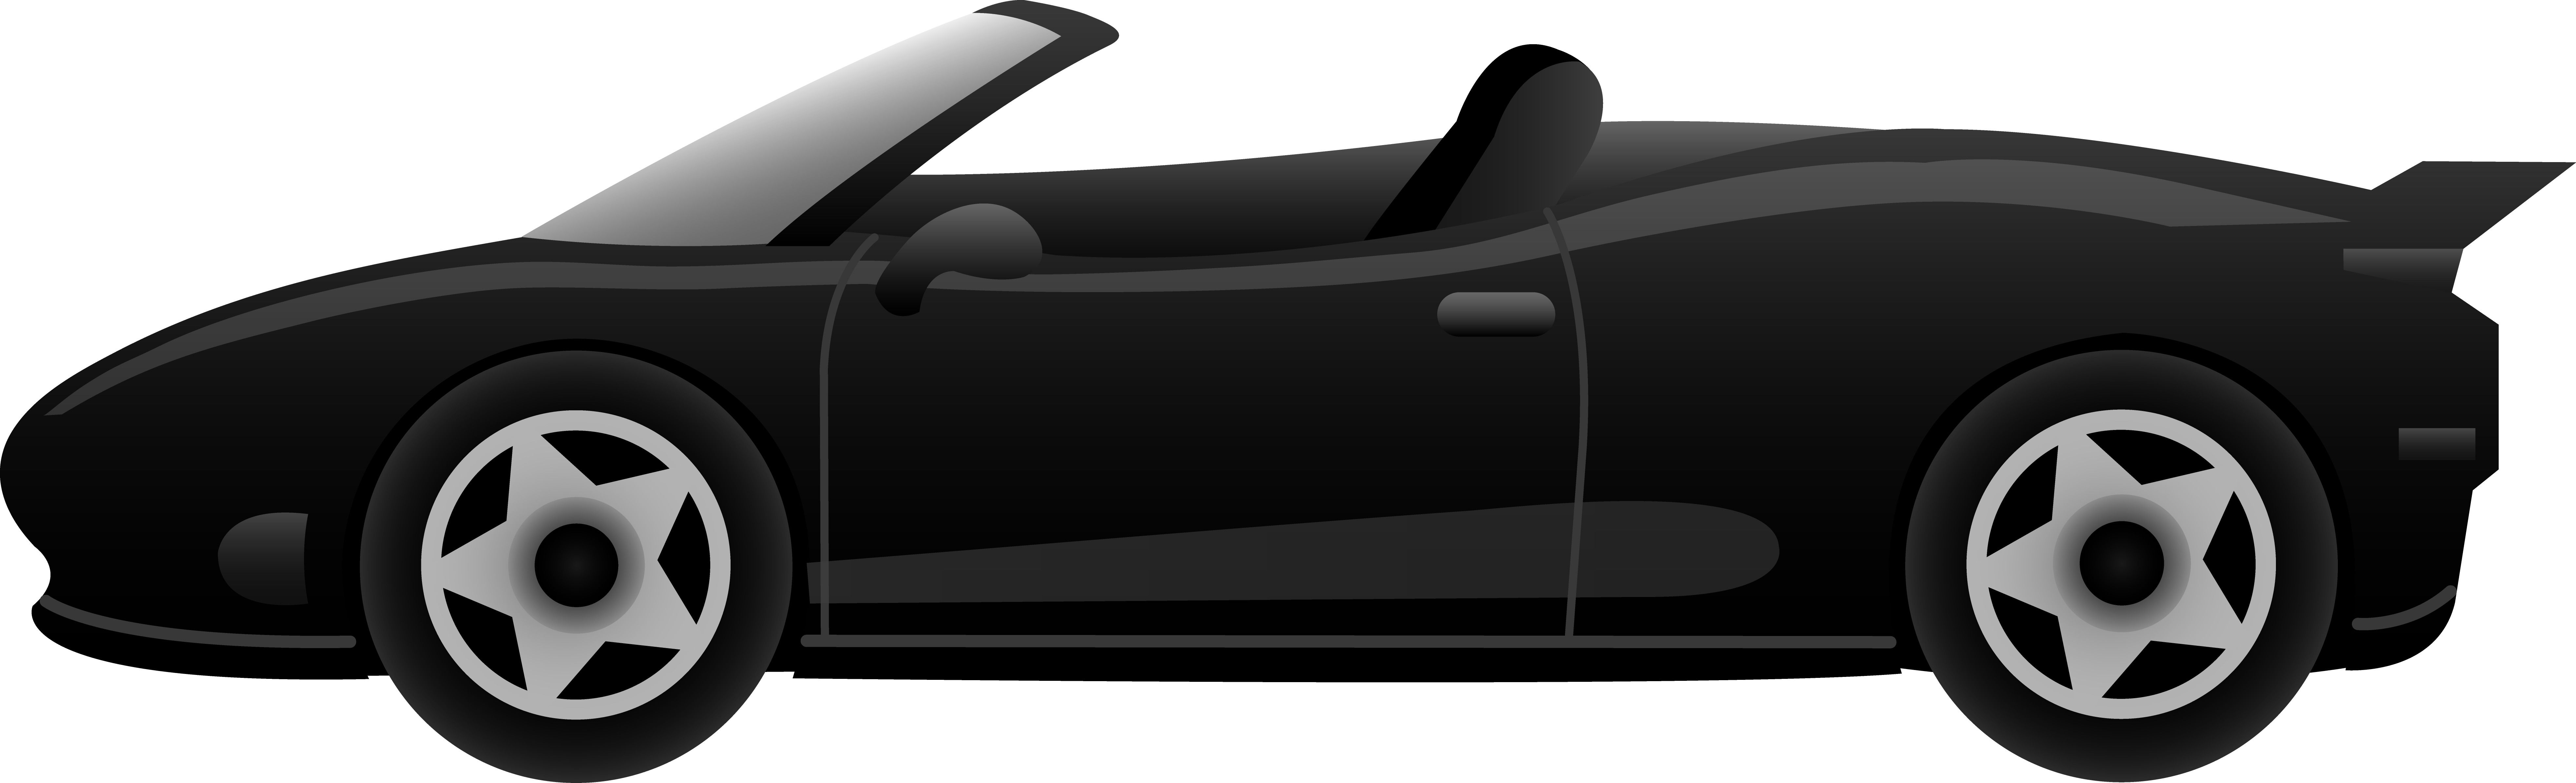 7863x2391 Race Car Clipart Side View